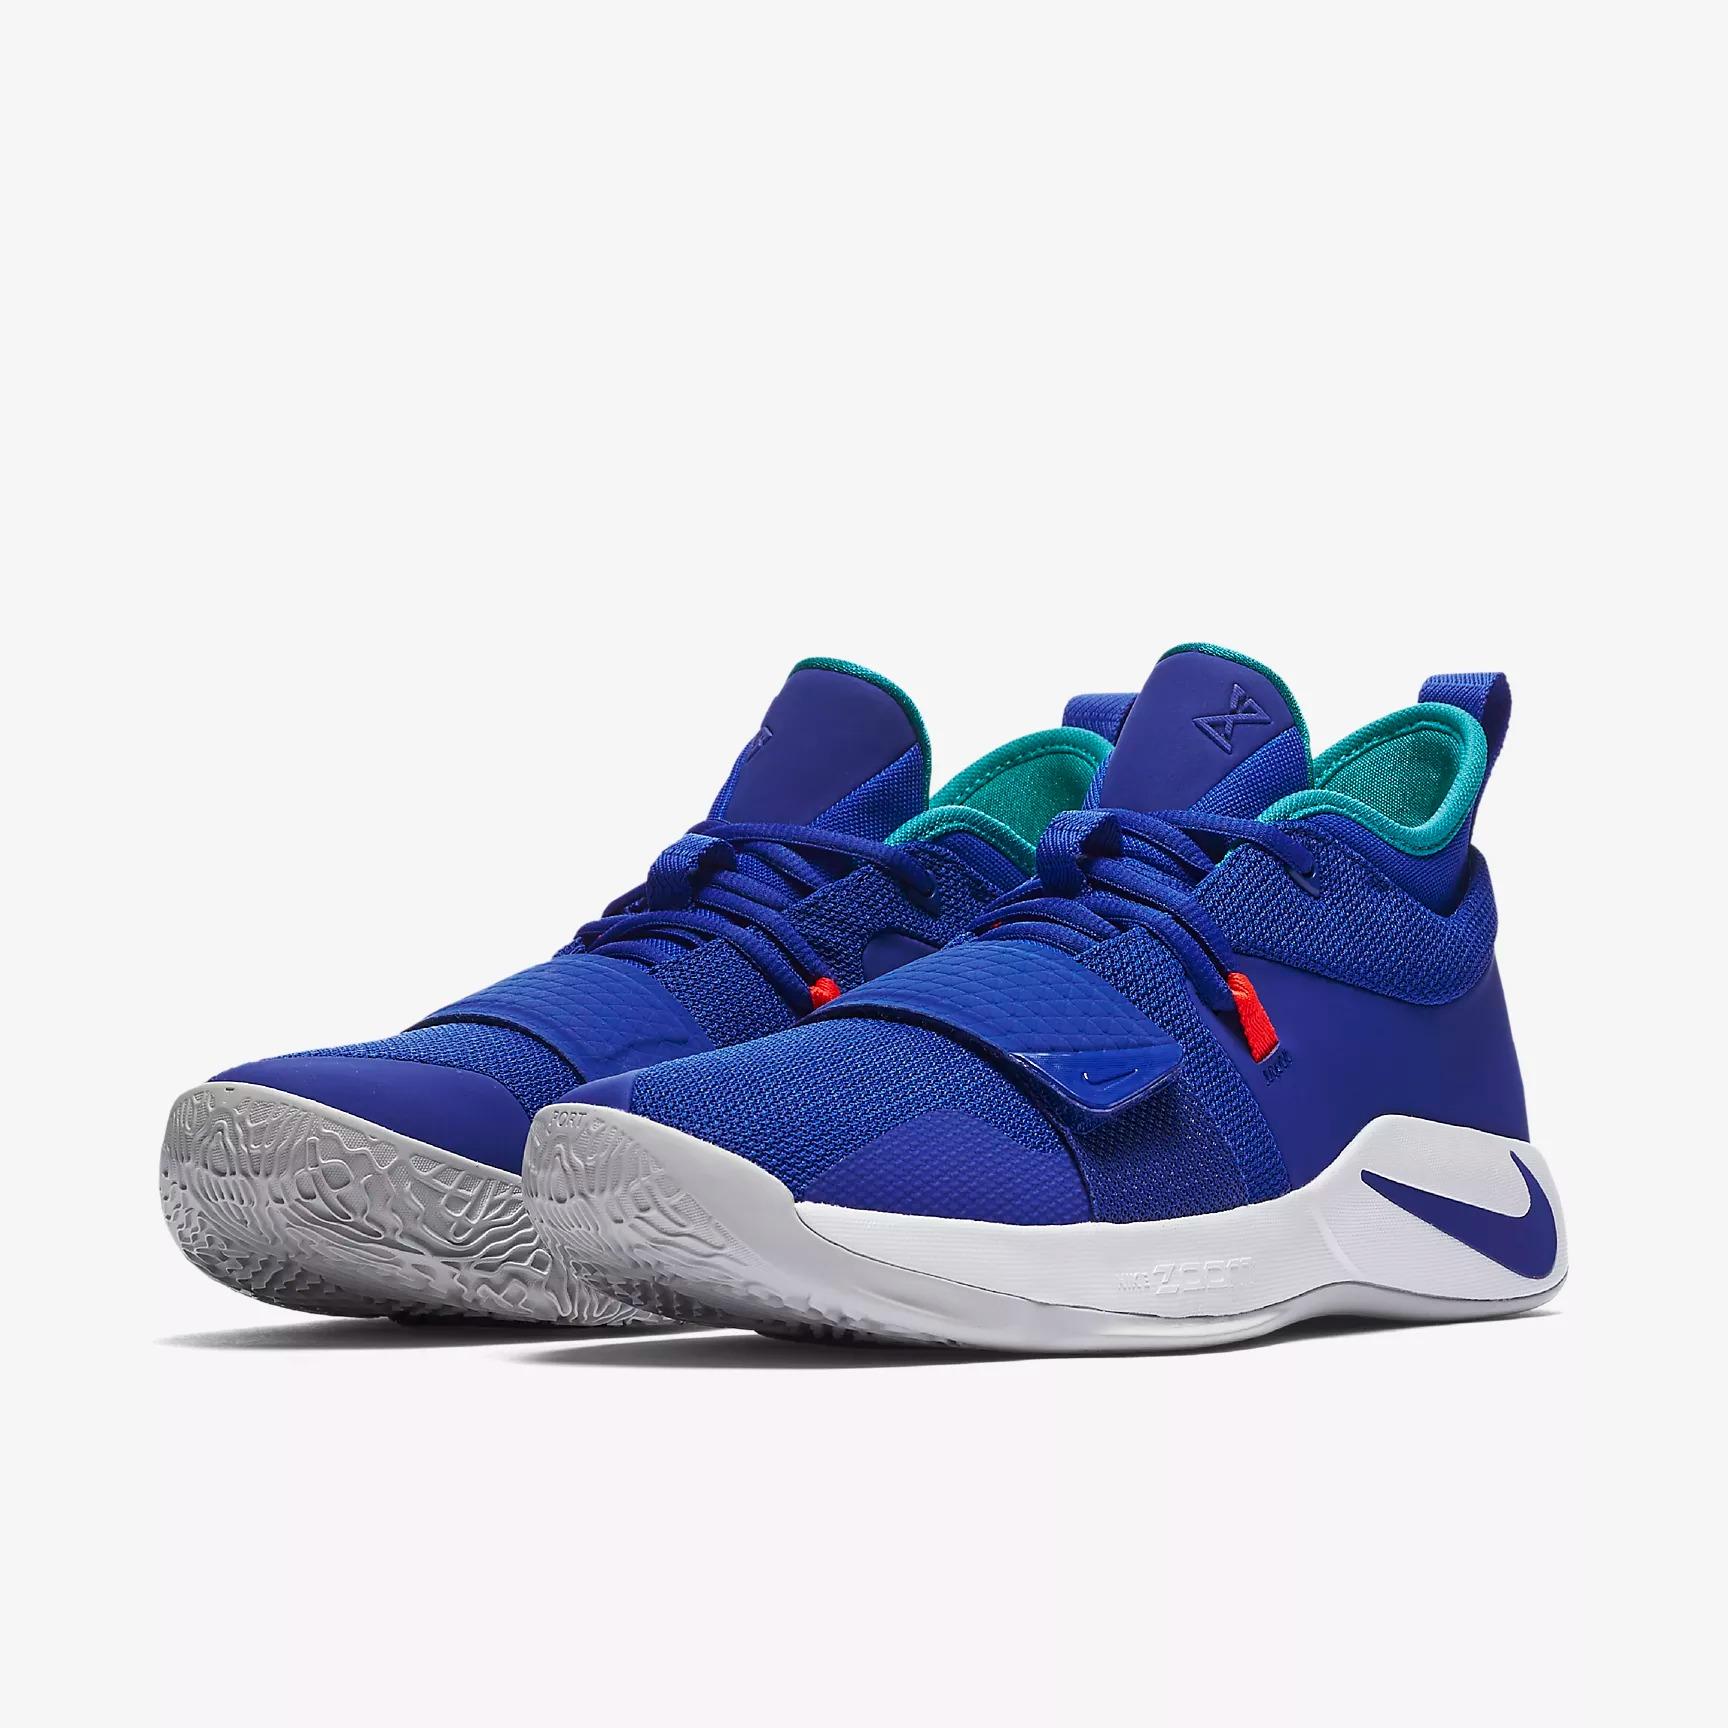 2cb36545966 Nike PG 2.5 Fortnite Basketball Shoes - BASKETBALL SHOES NIKE Basketball  Shoes - Superfanas.lt